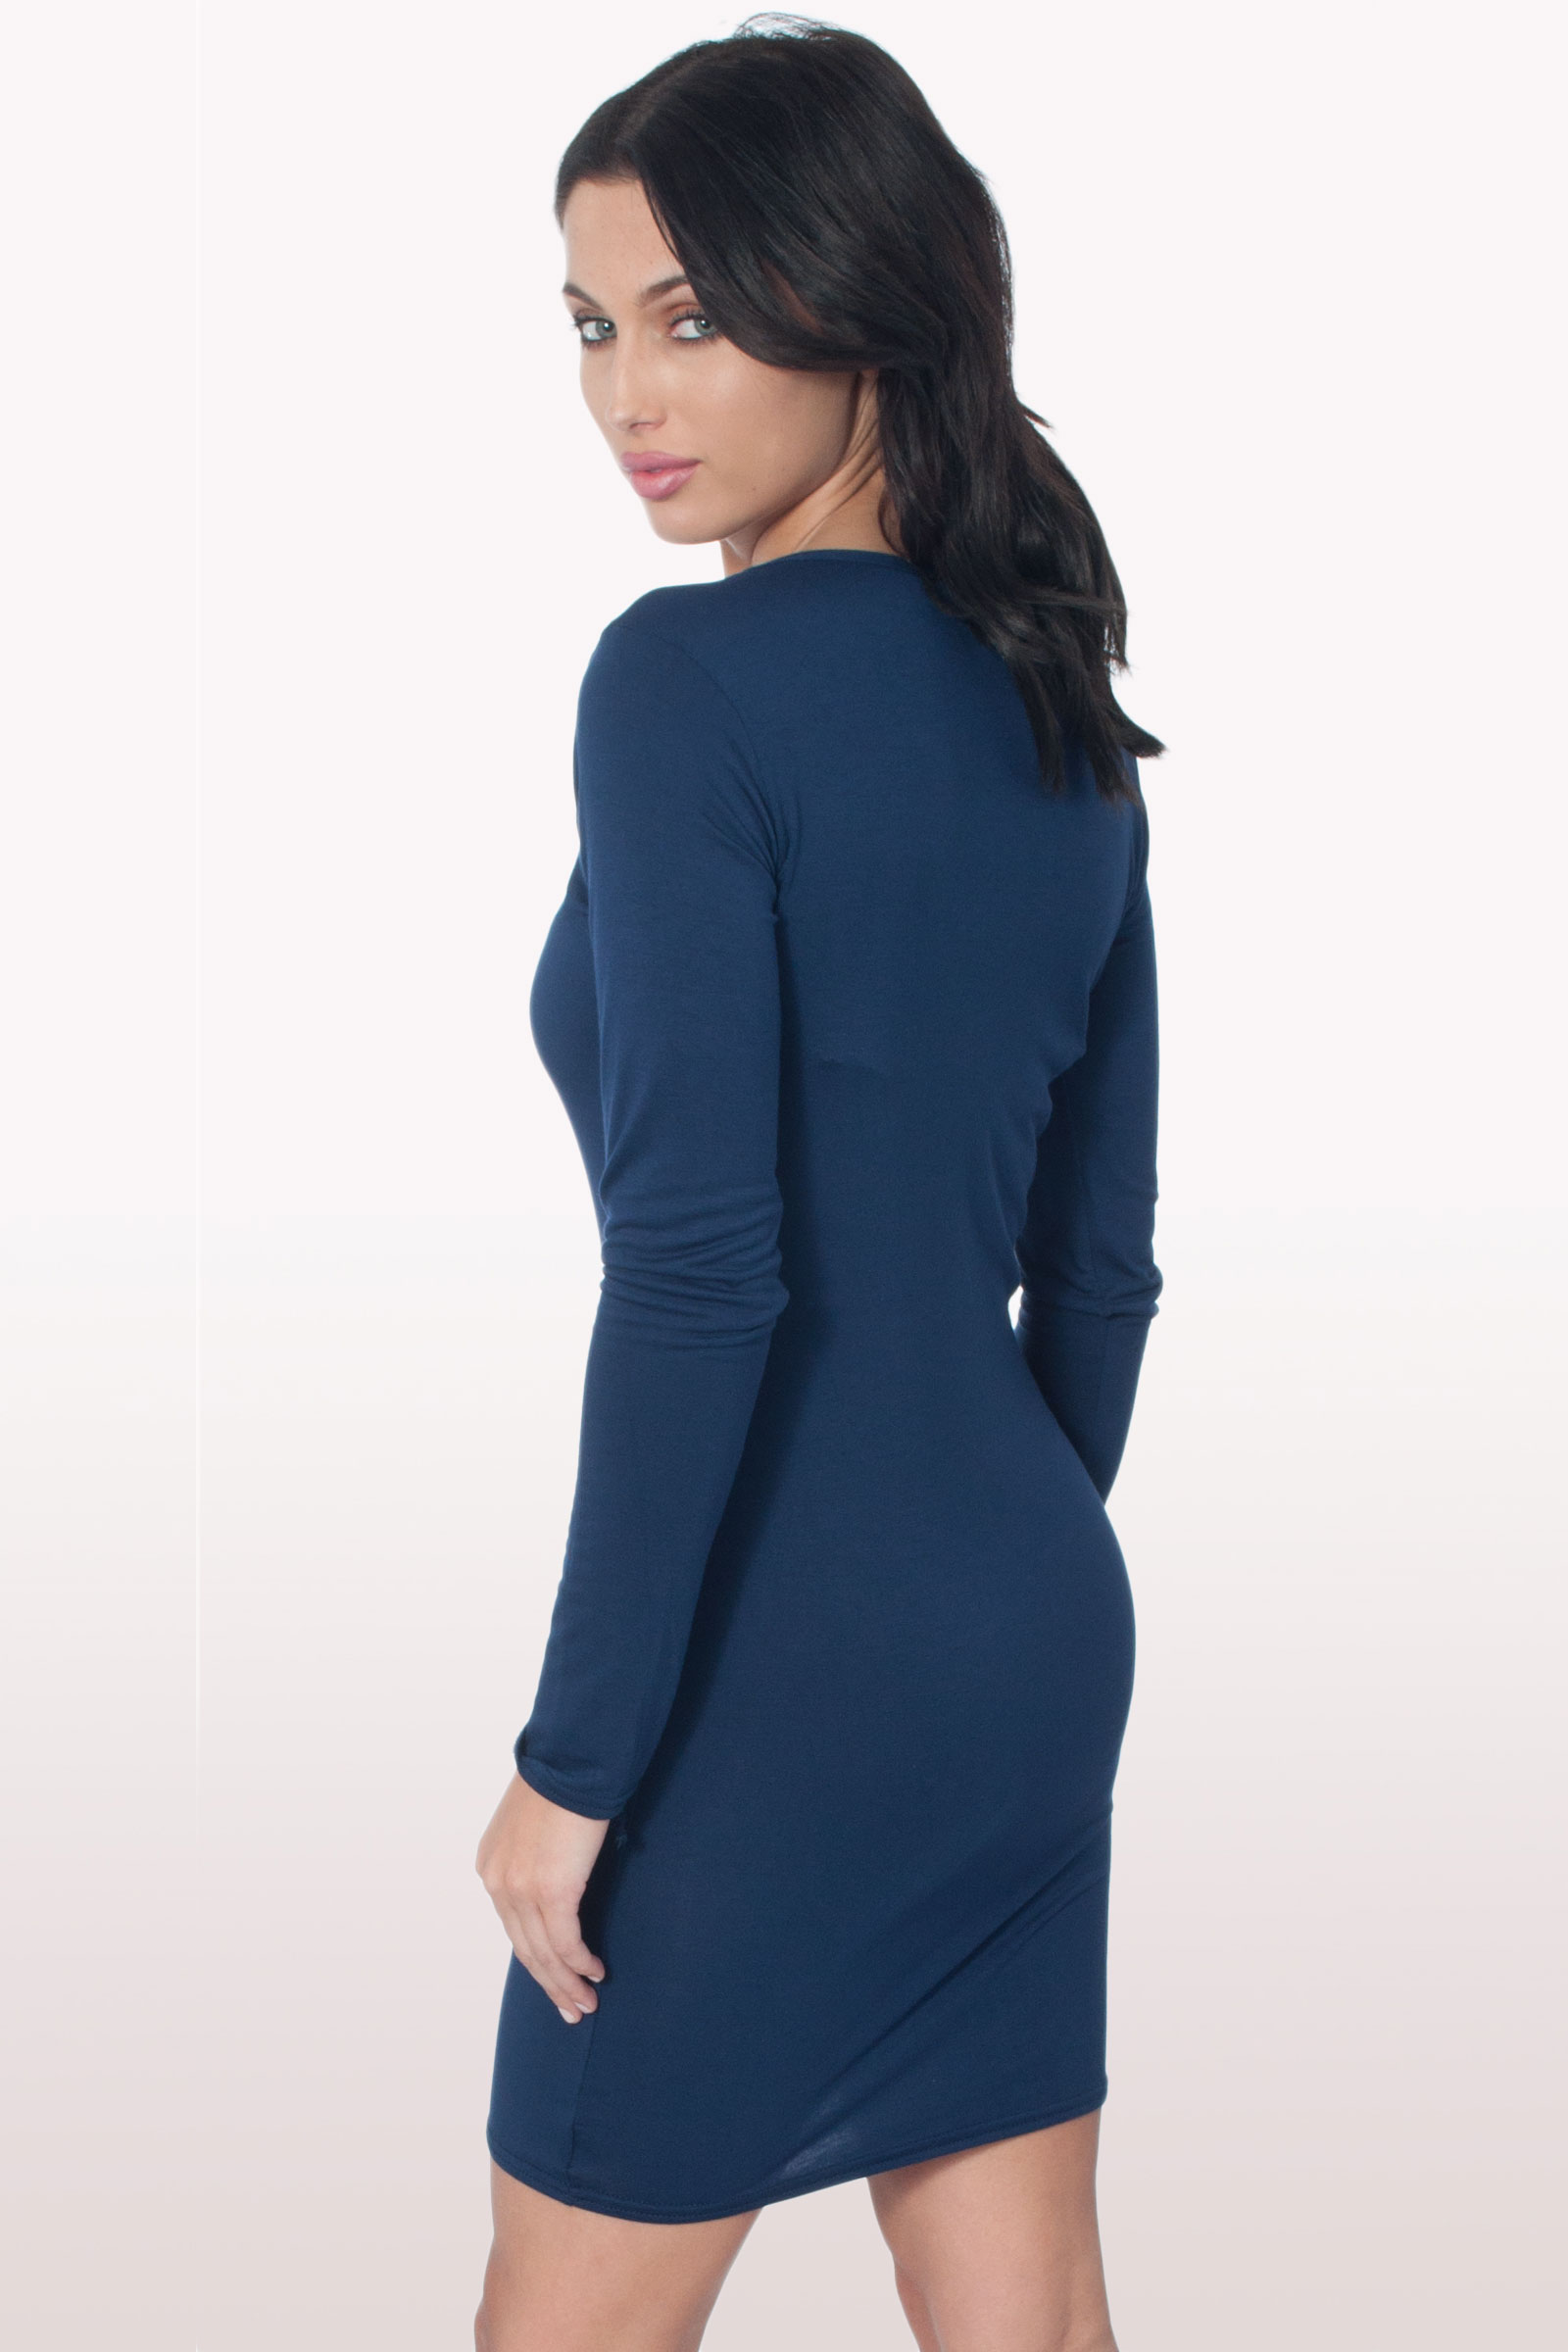 Girls navy long sleeve bodycon dress sizes online online